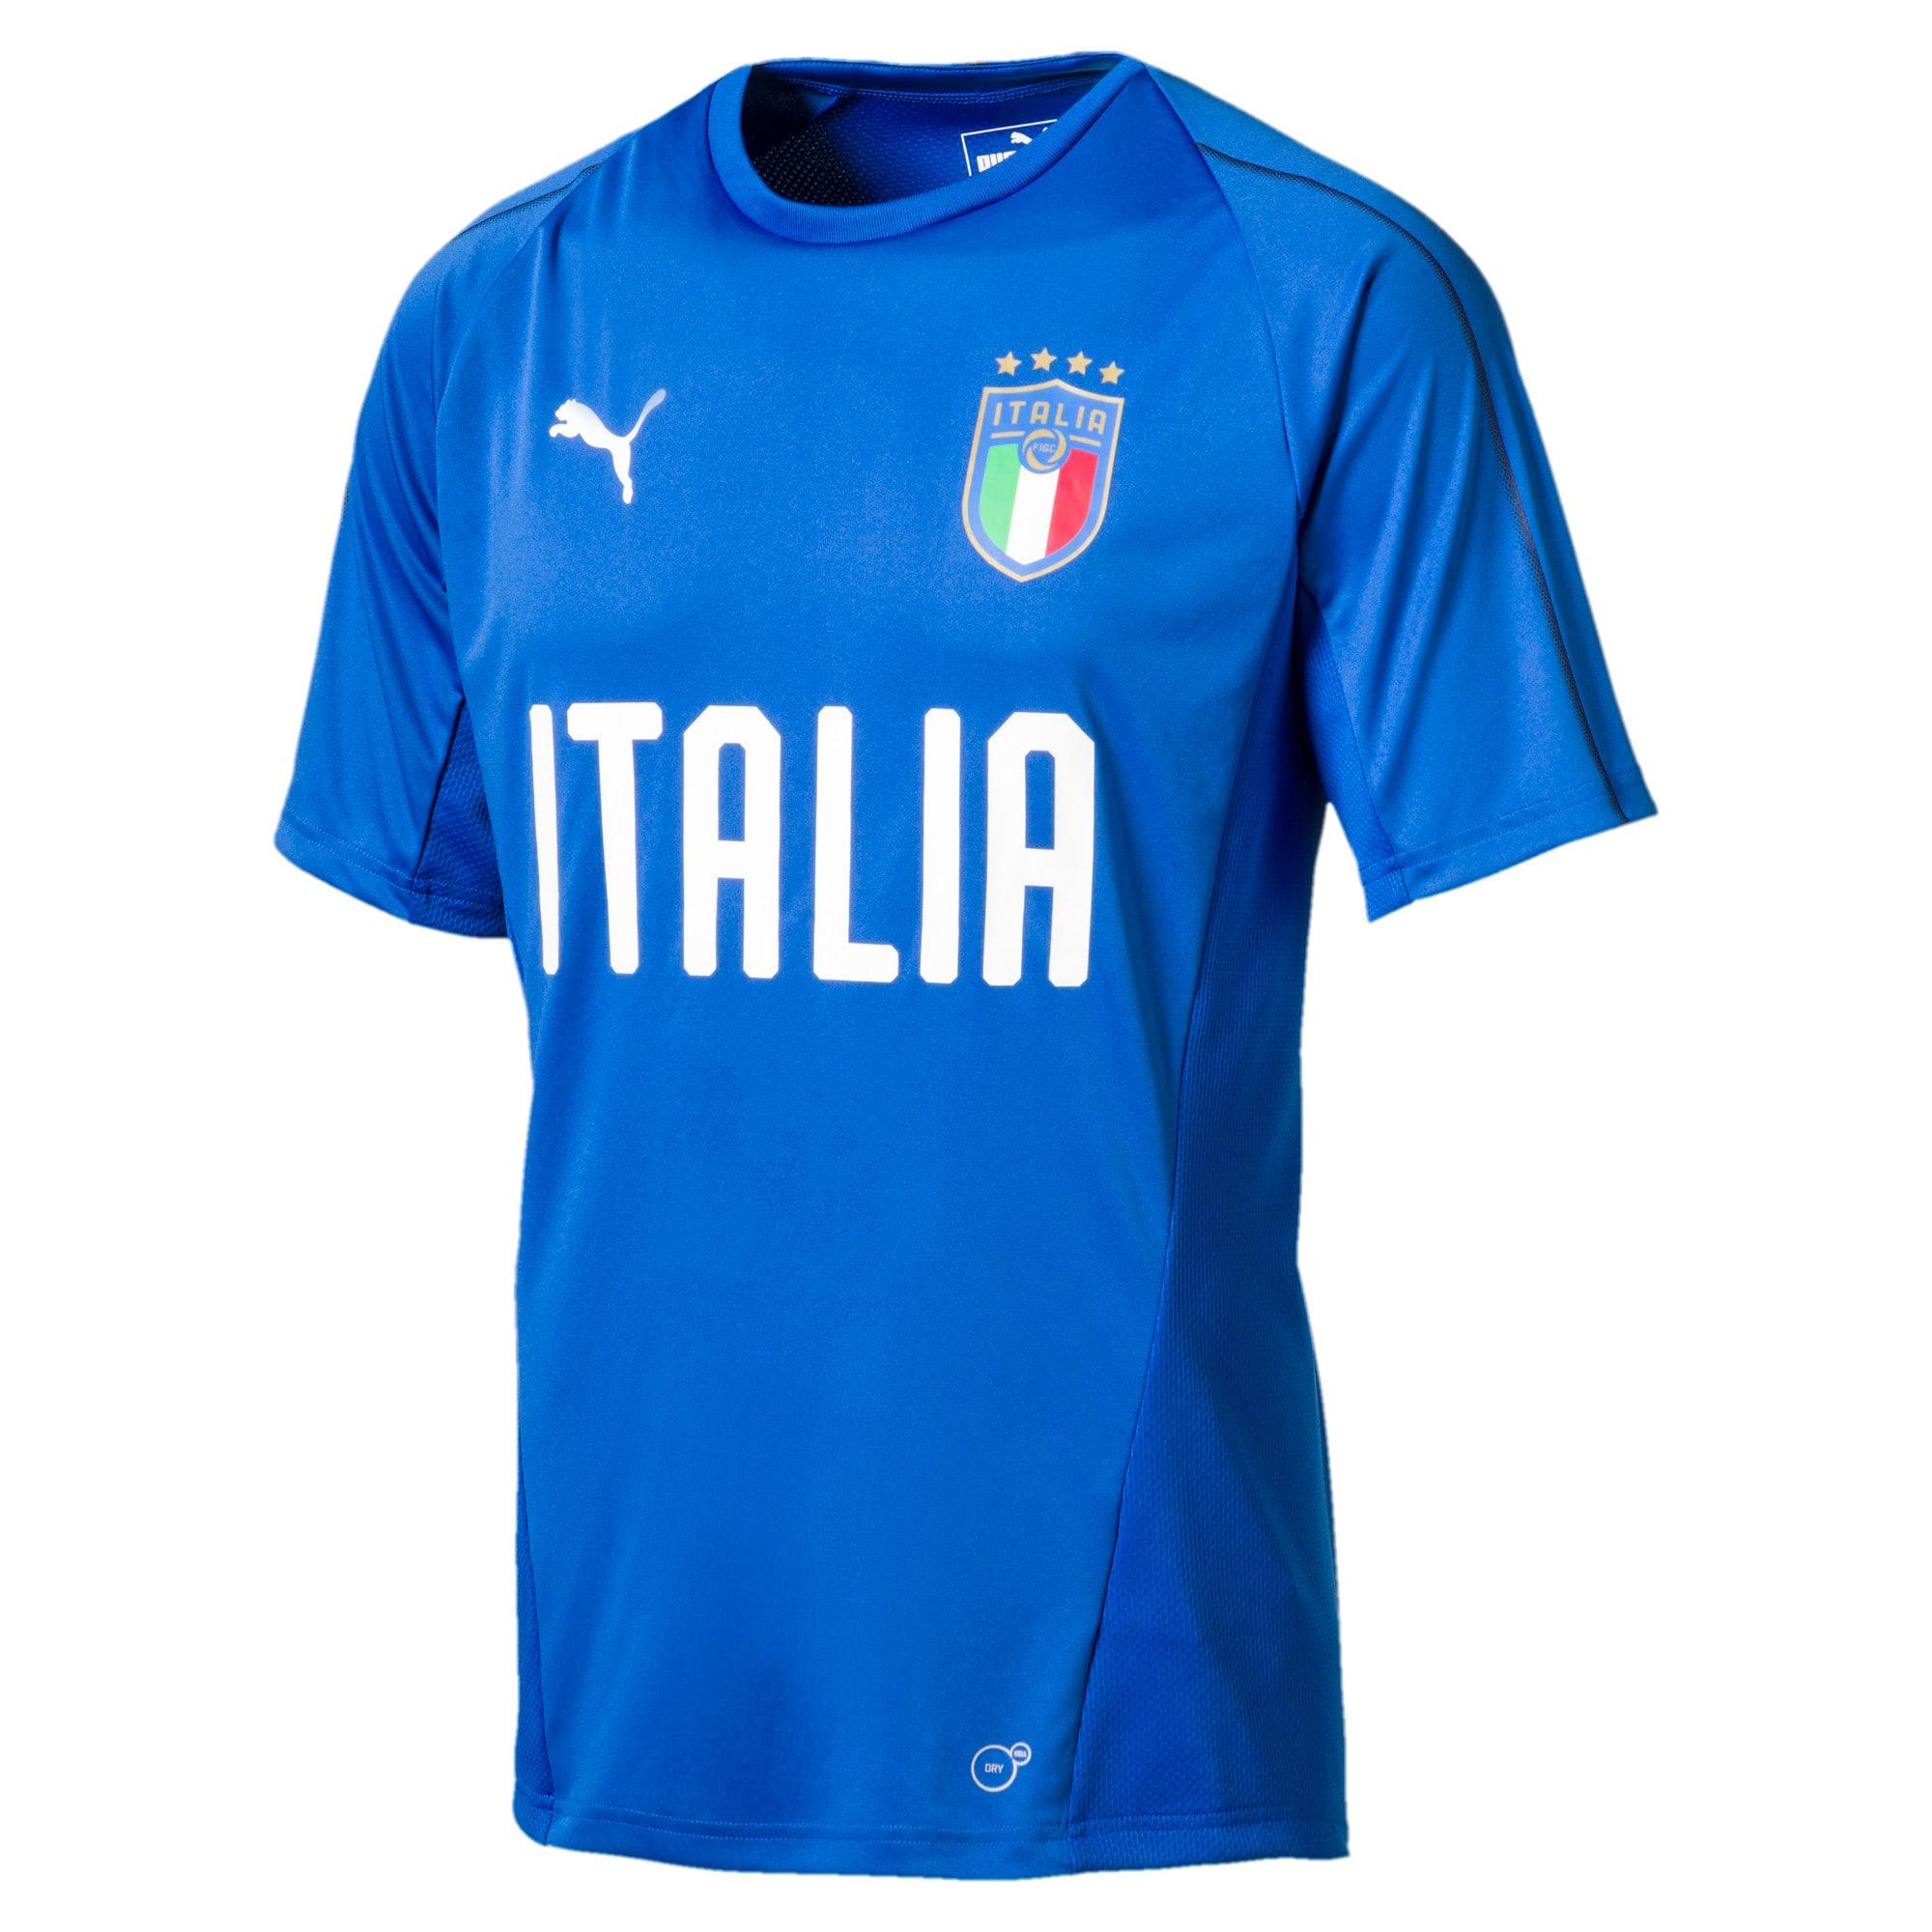 Thumbnail 1 of FIGC ITALIA トレーニングジャージー SS, Team Power Blue-Puma White, medium-JPN